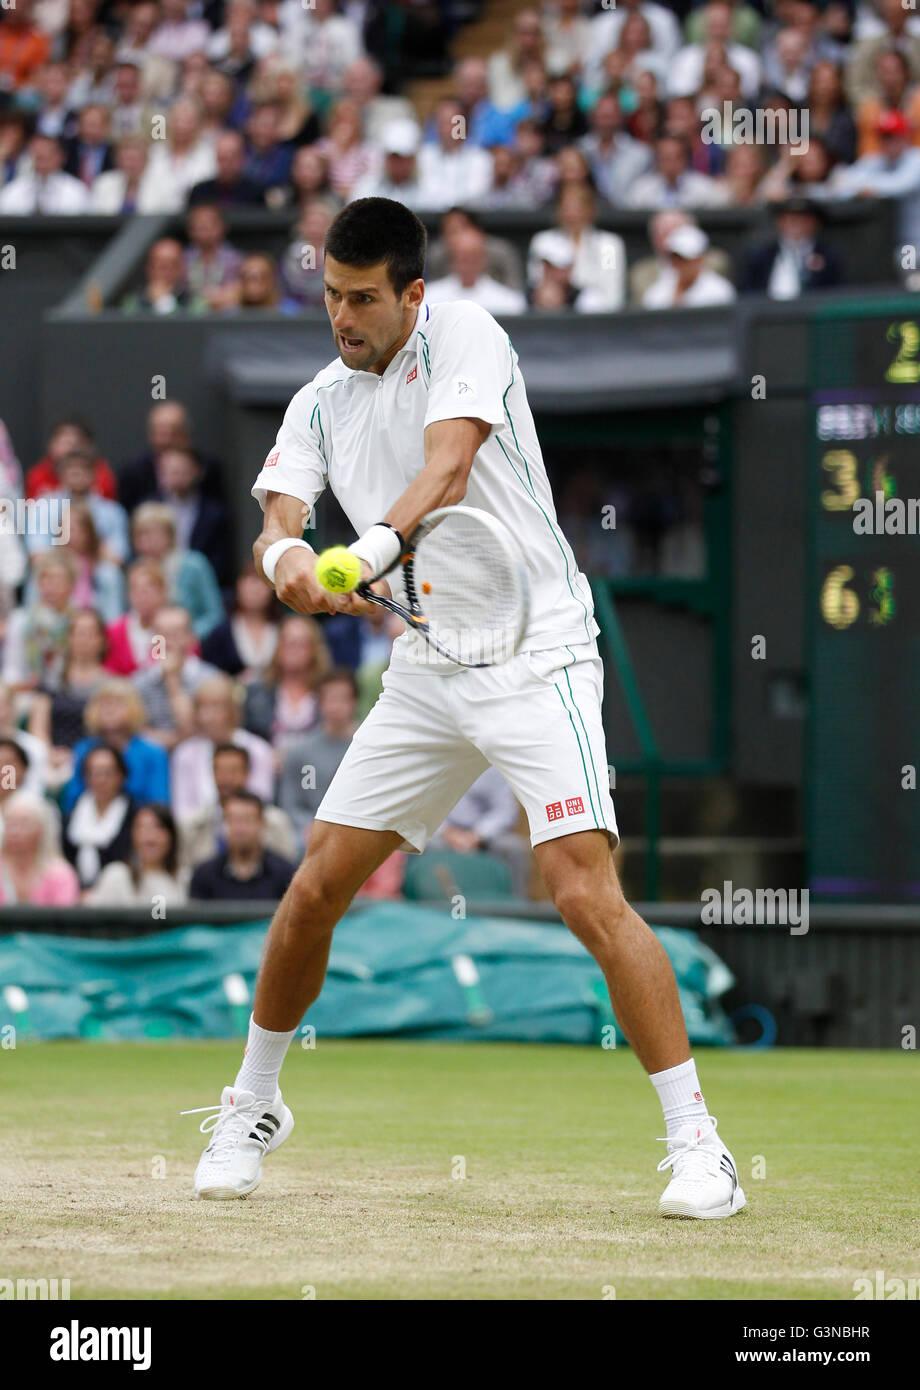 Novak Djokovic, SRB, men's semi-final match, Wimbledon Championships 2012 AELTC, ITF Grand Slam Tennis Tournament, - Stock Image